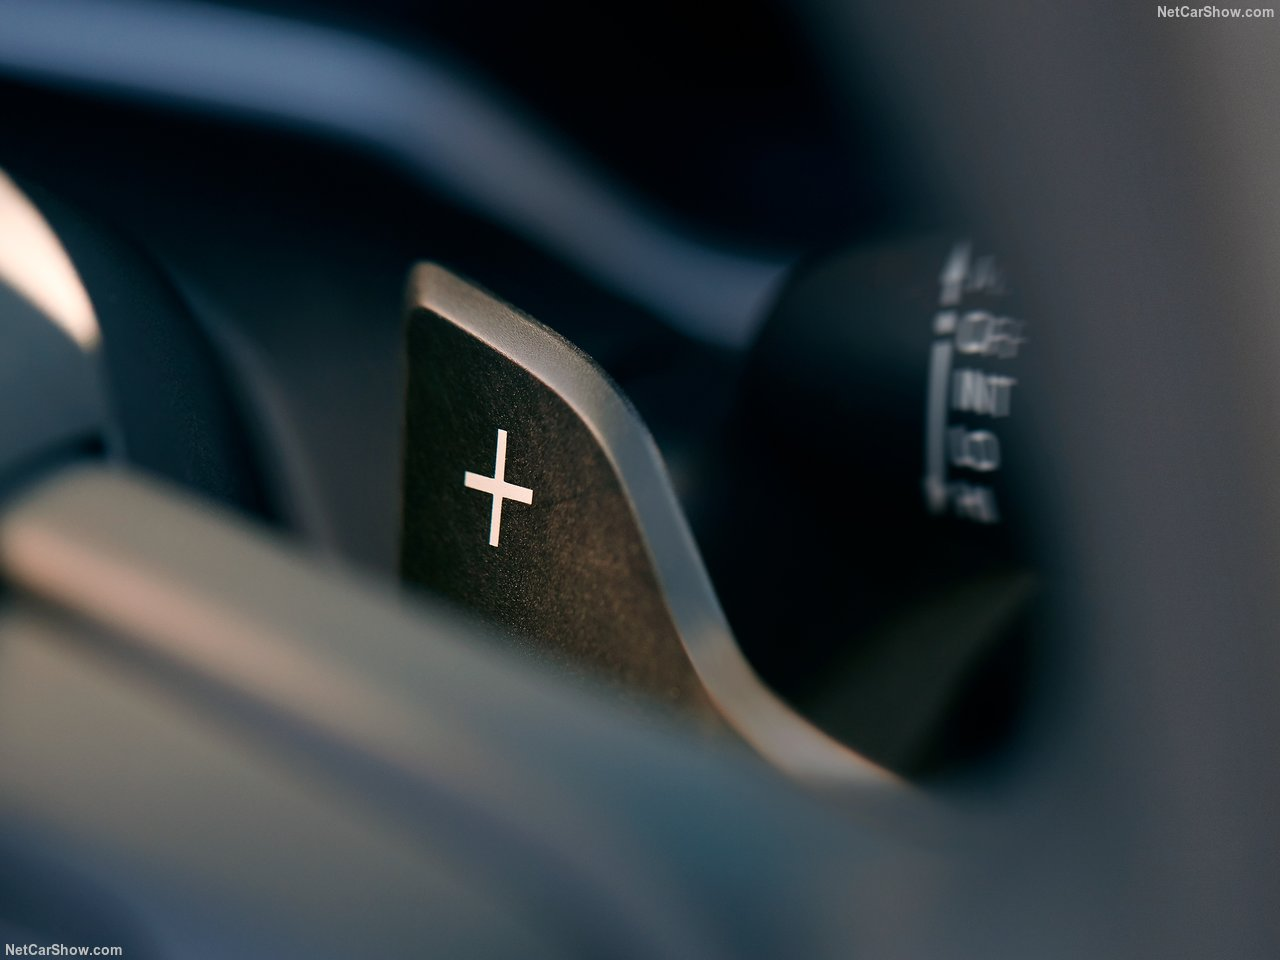 Toyota-Corolla_Hatchback-2019-1280-4e.jpg